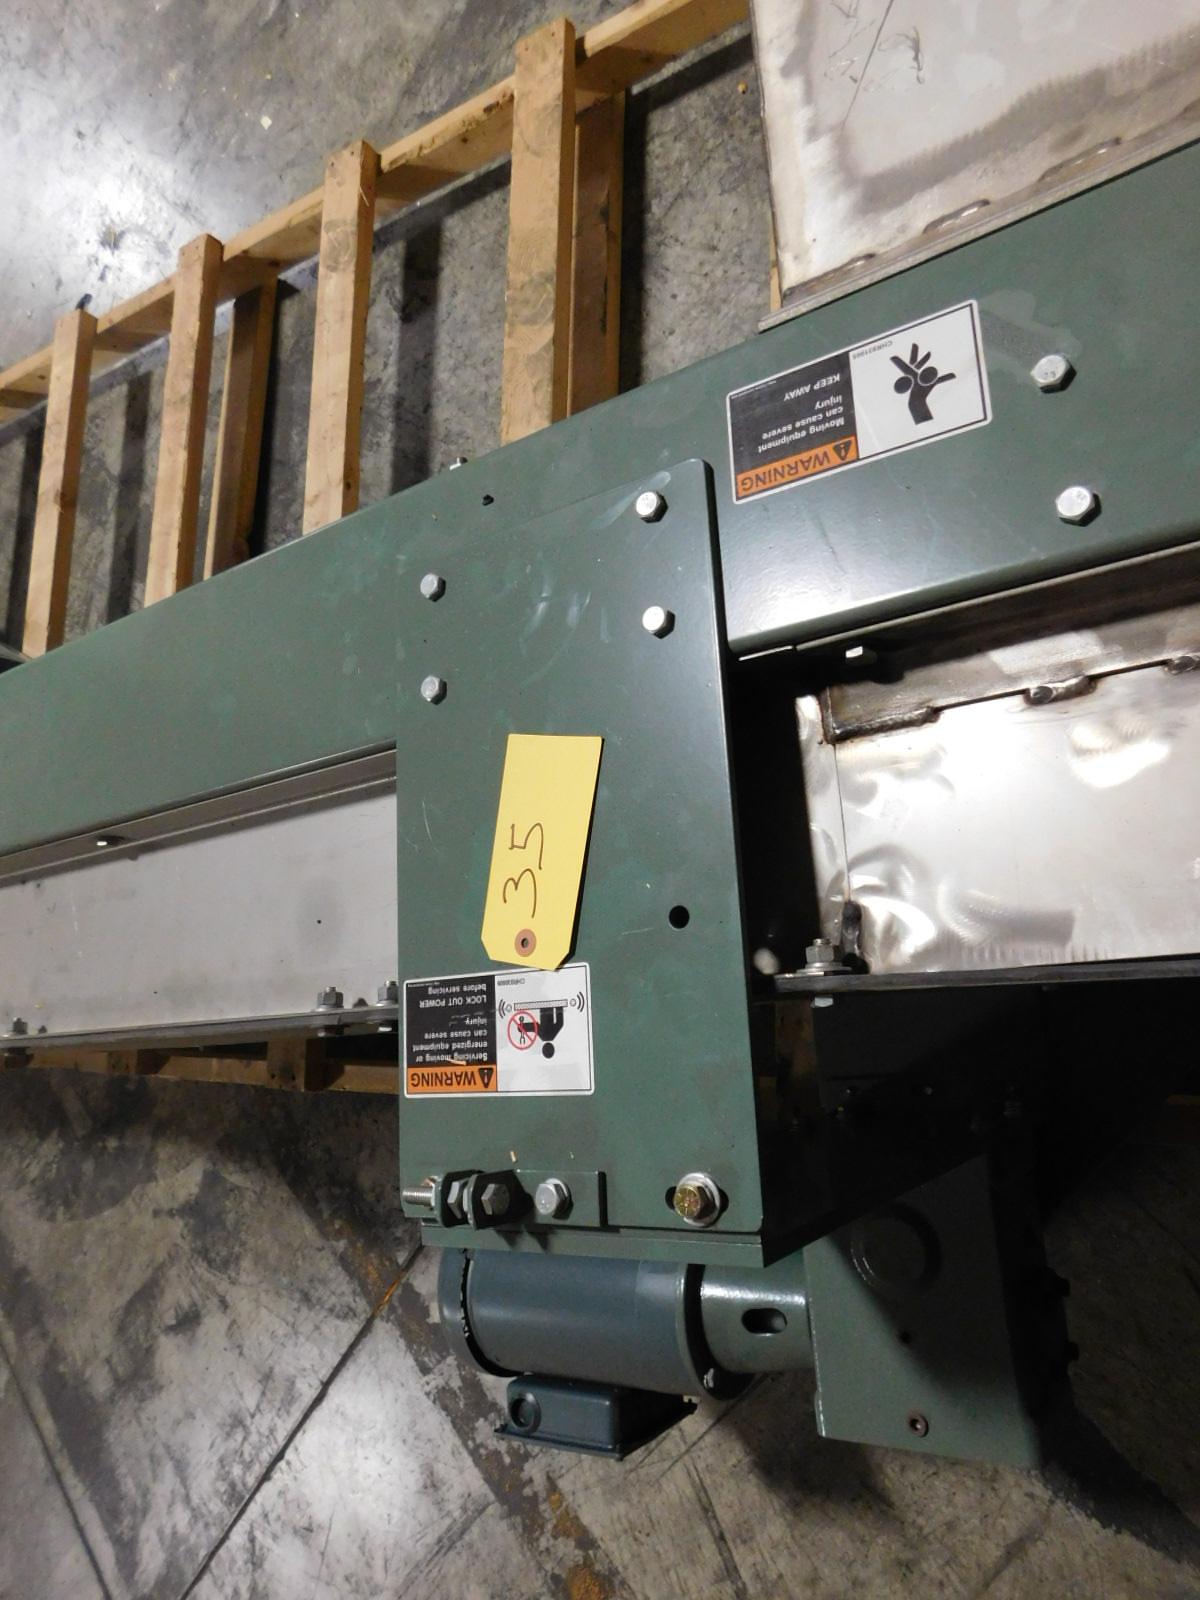 Lot 35 - Hytrol Elevator 11ft. Incline motorized conveyor,460v,3 phase :equipment located at Clark Logistic